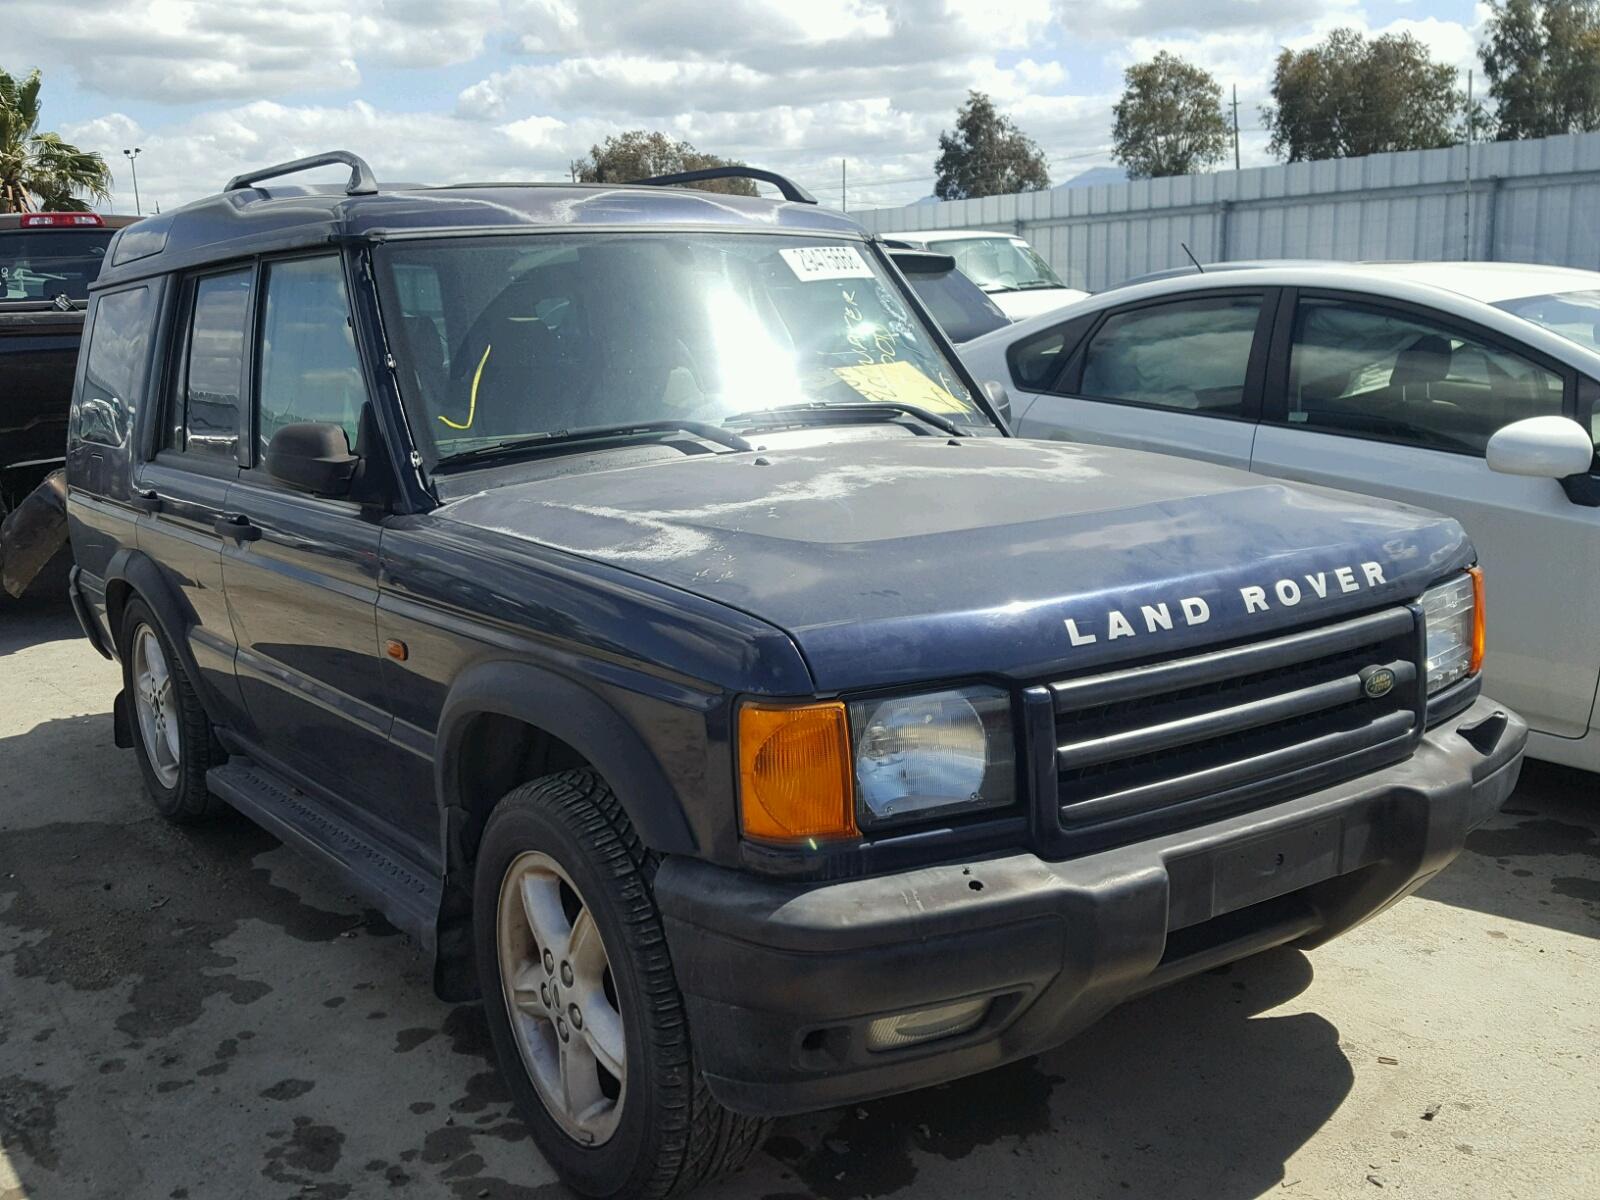 carfinder online auctions on land auto for se rover hse copart lot ended landrover receipt auction en sale ca vin hayward junk